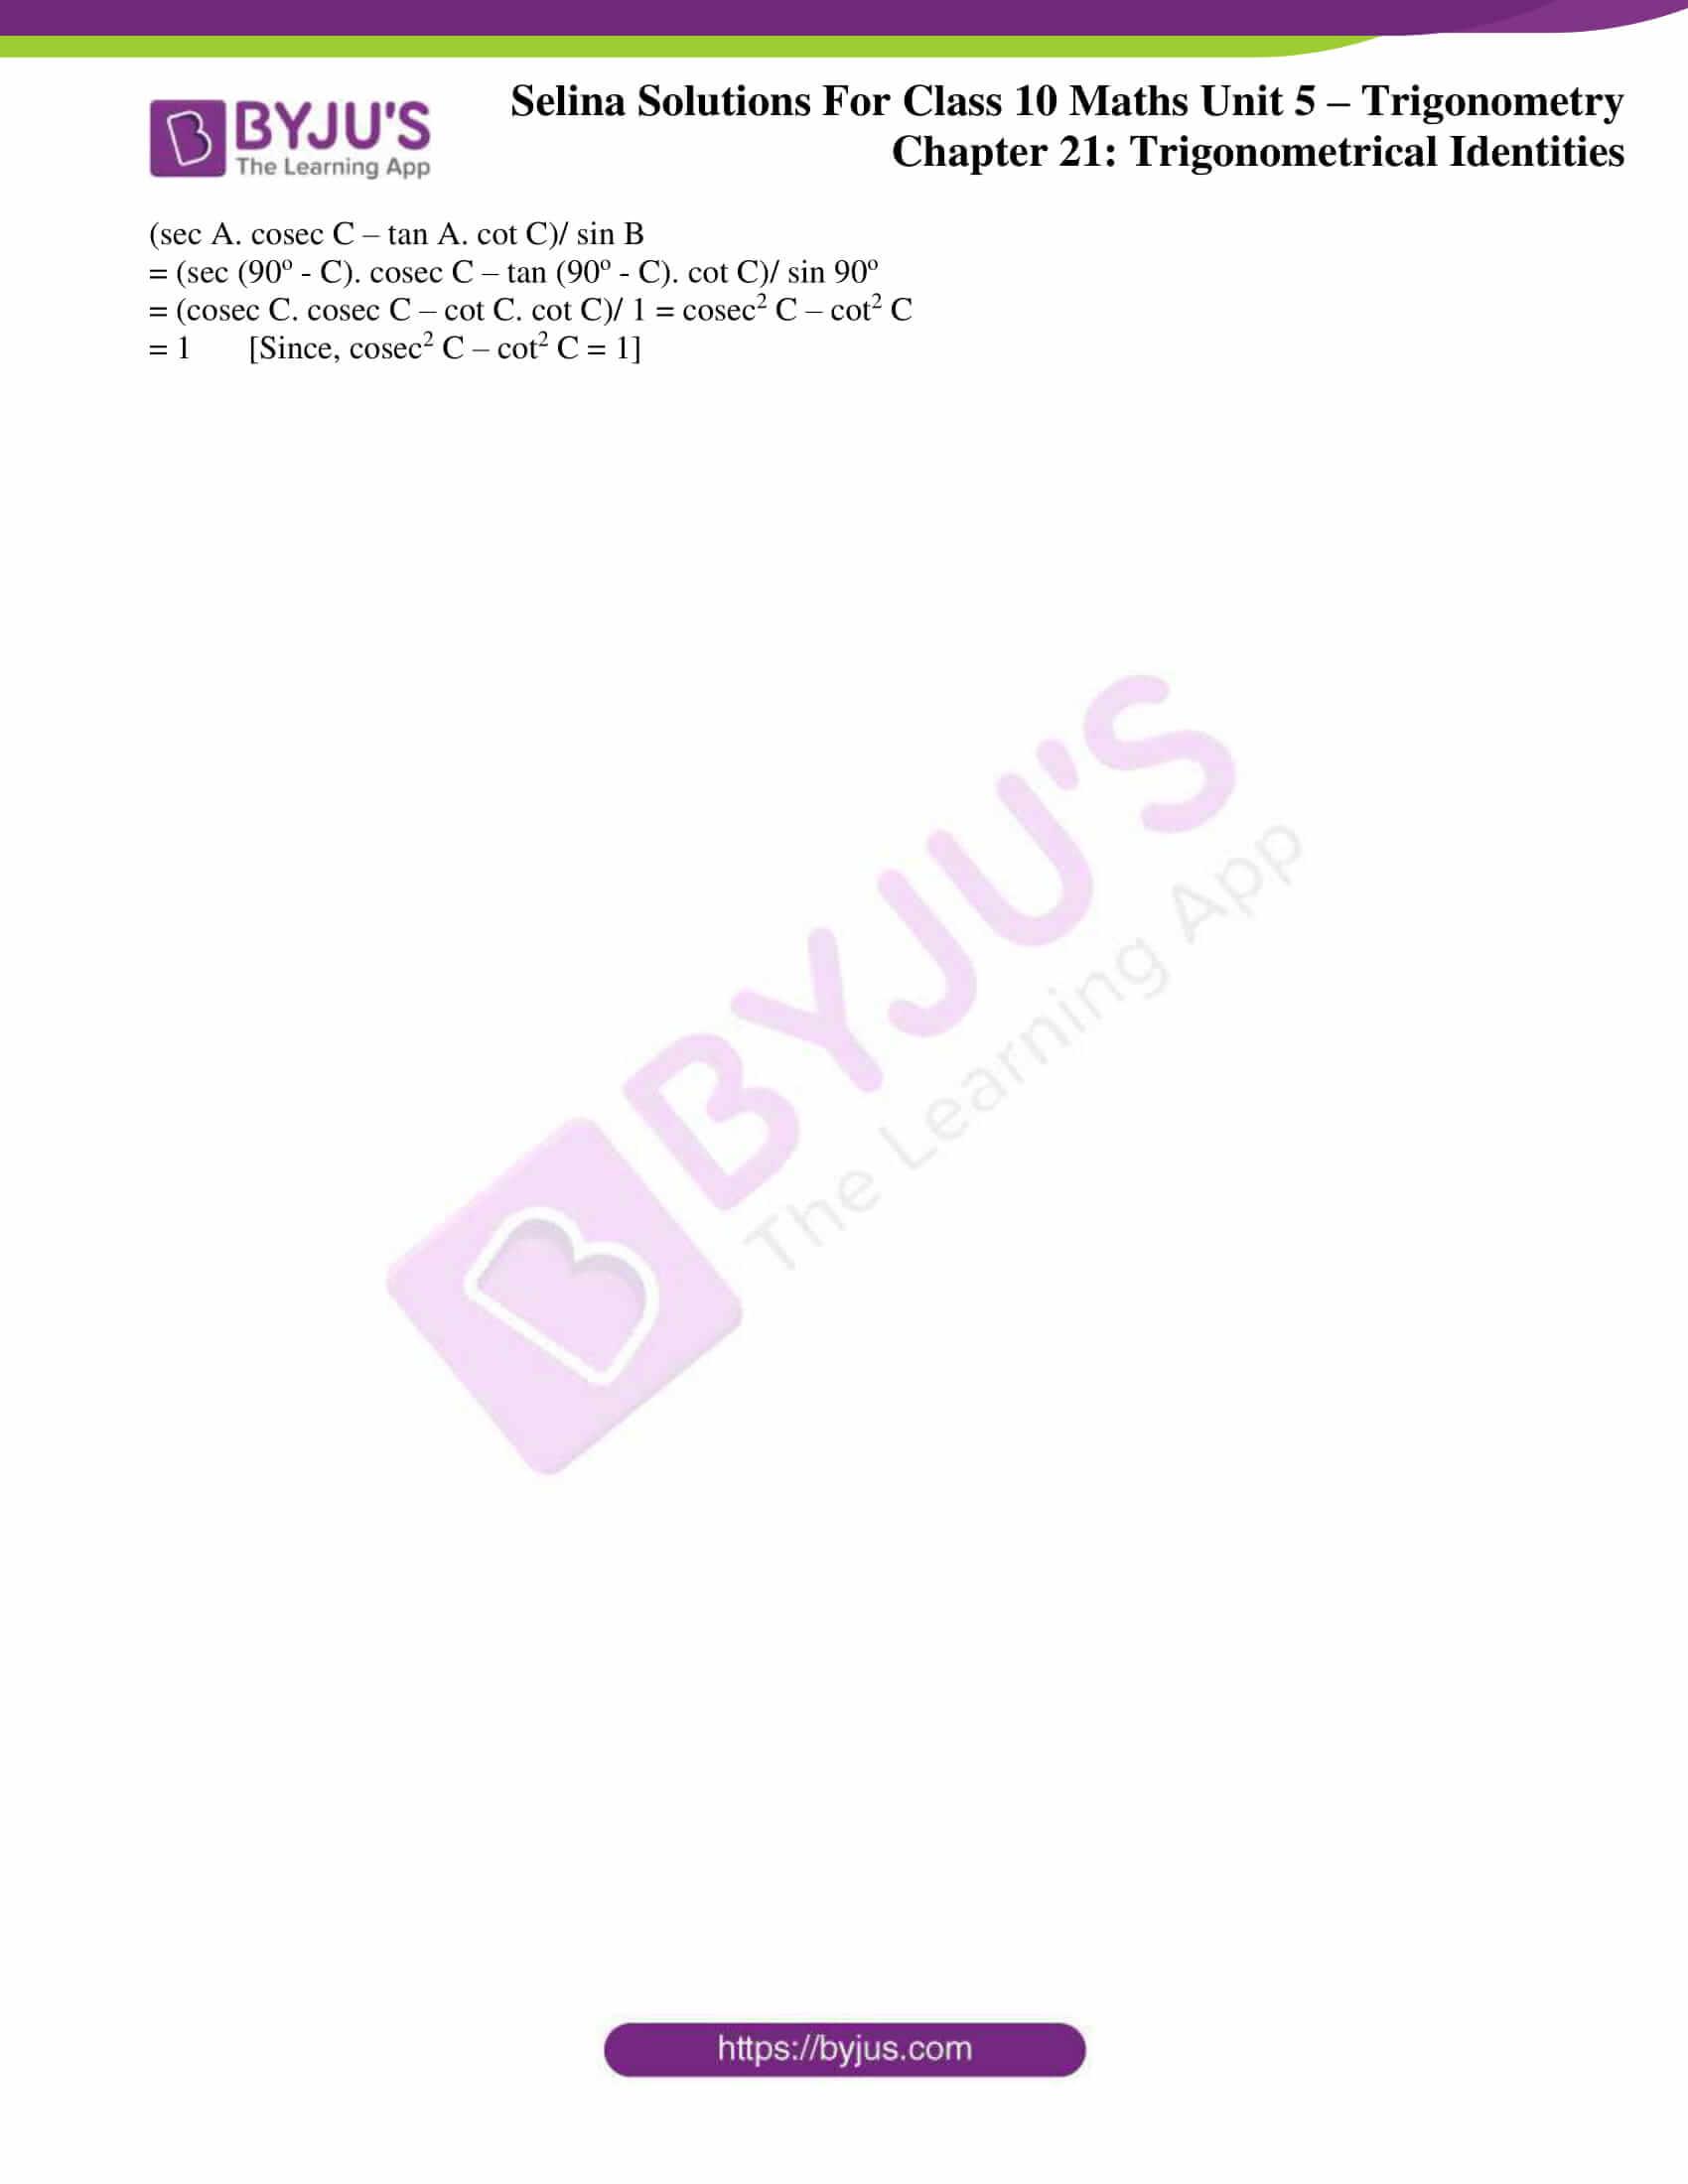 selina-sol-maths-class-10-ch-21-ex-c-5